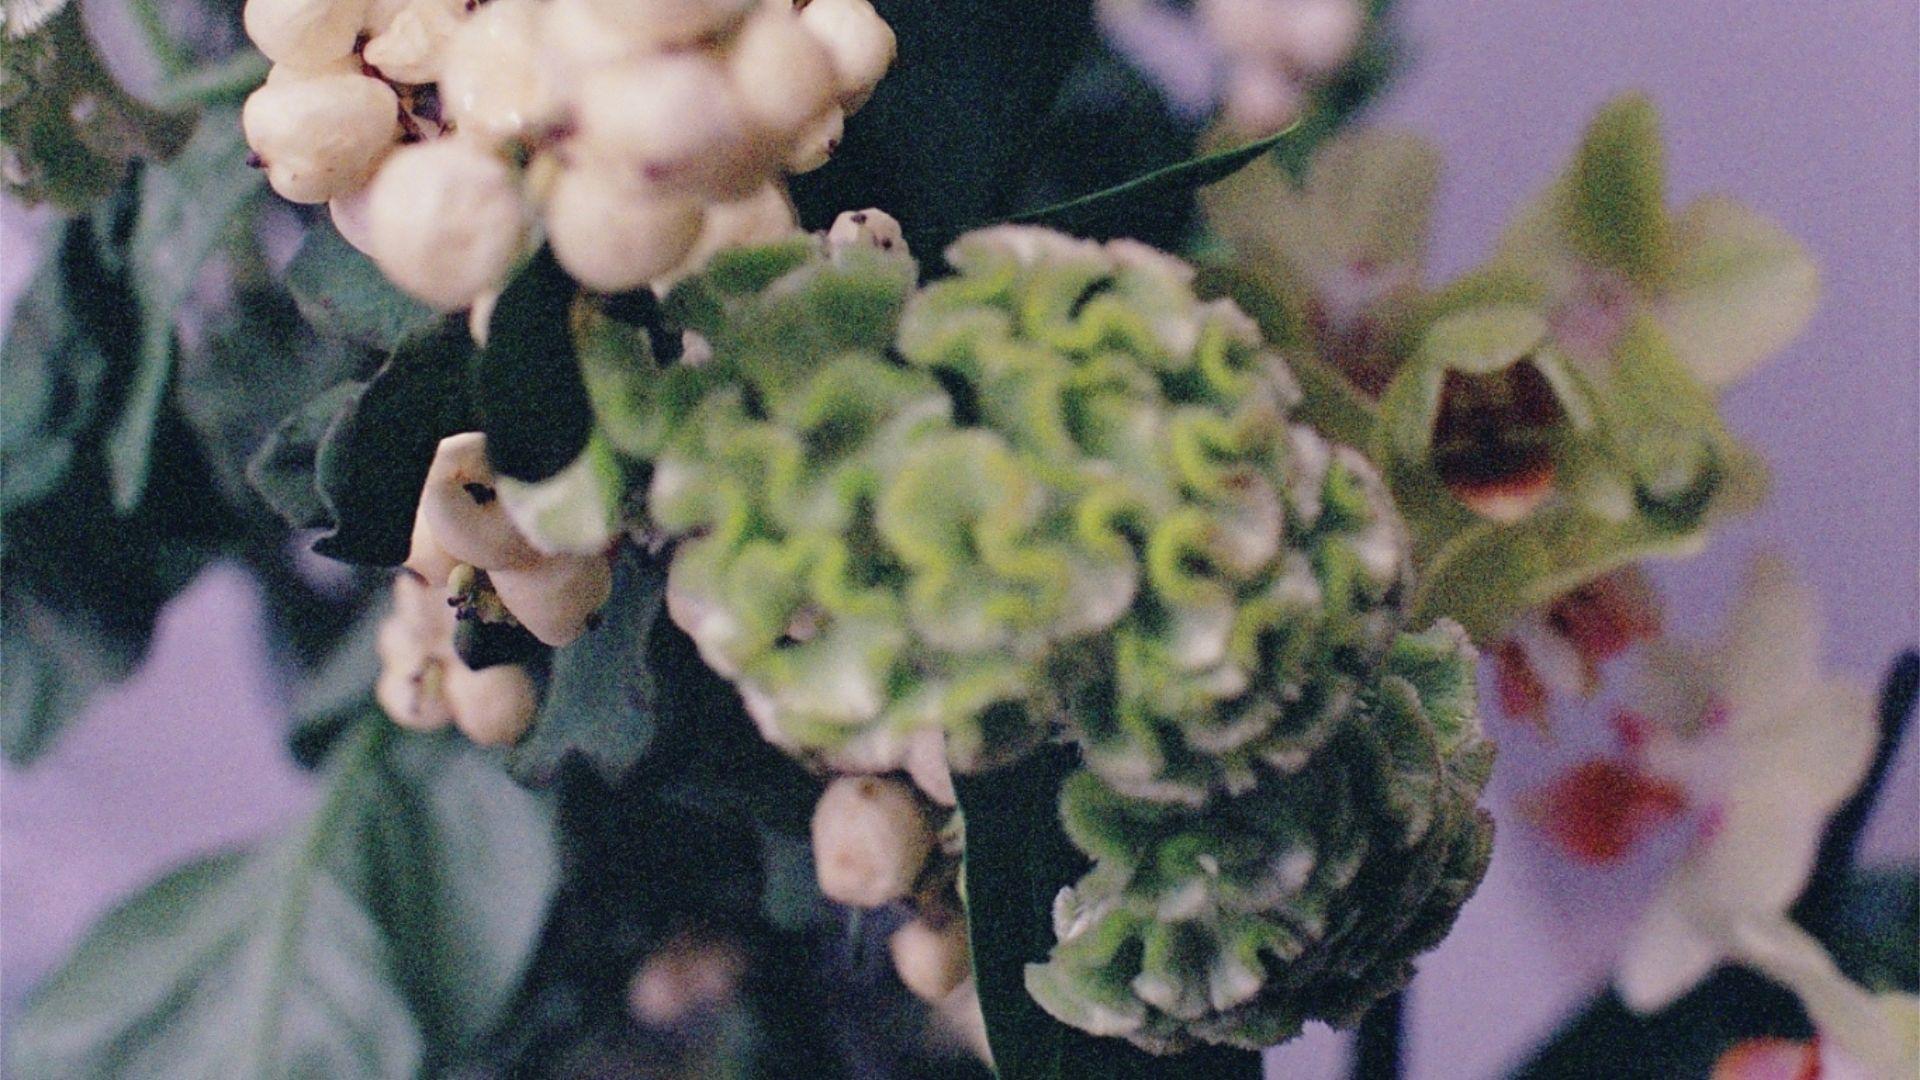 grainy image of plants against a purple backdrop